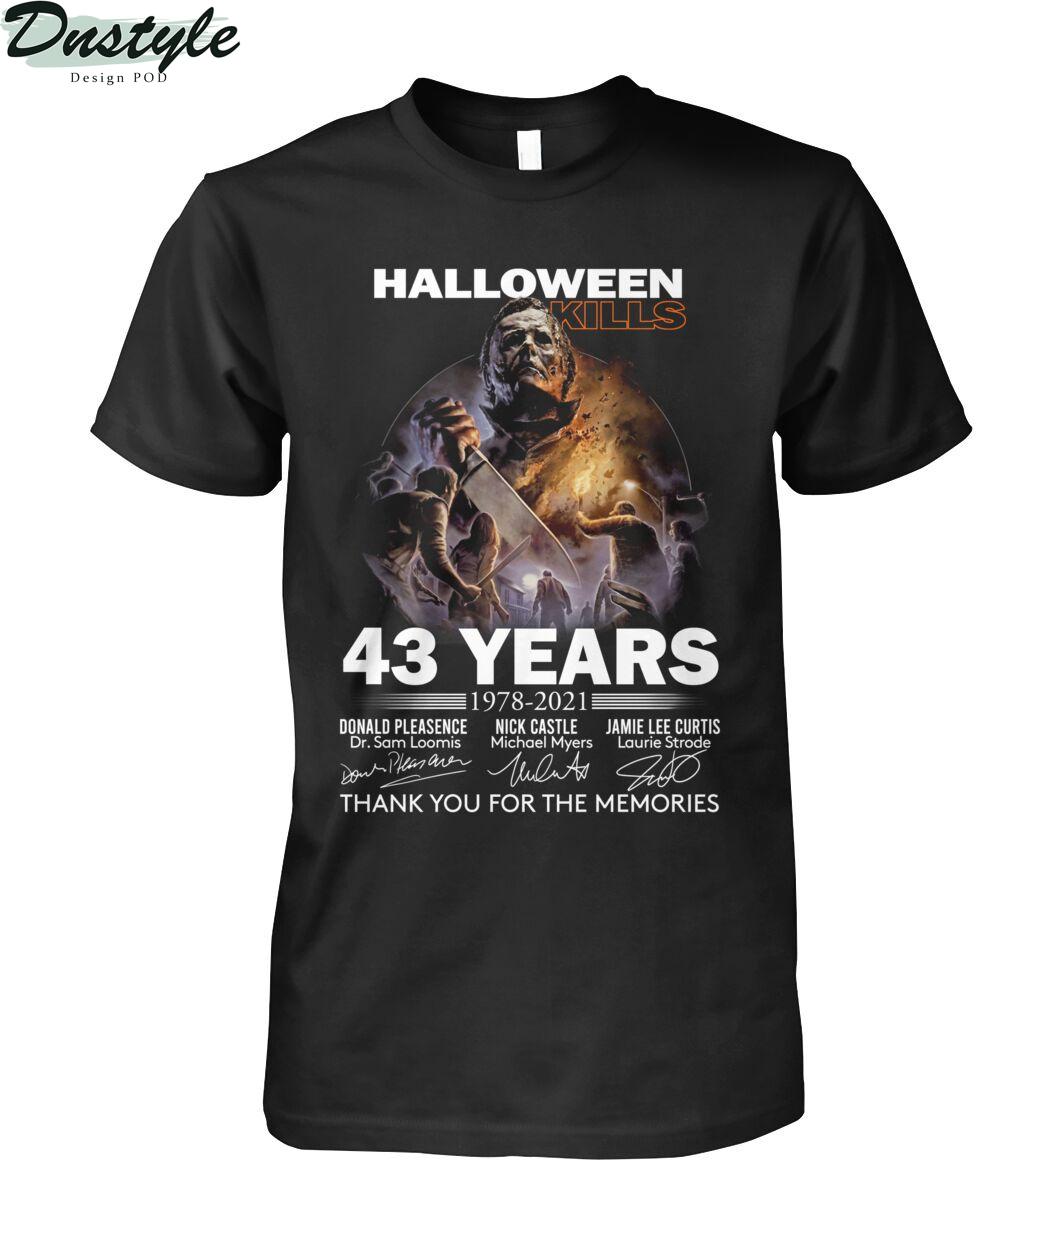 Michael myers halloween kills 43 years thank you for the memories shirt